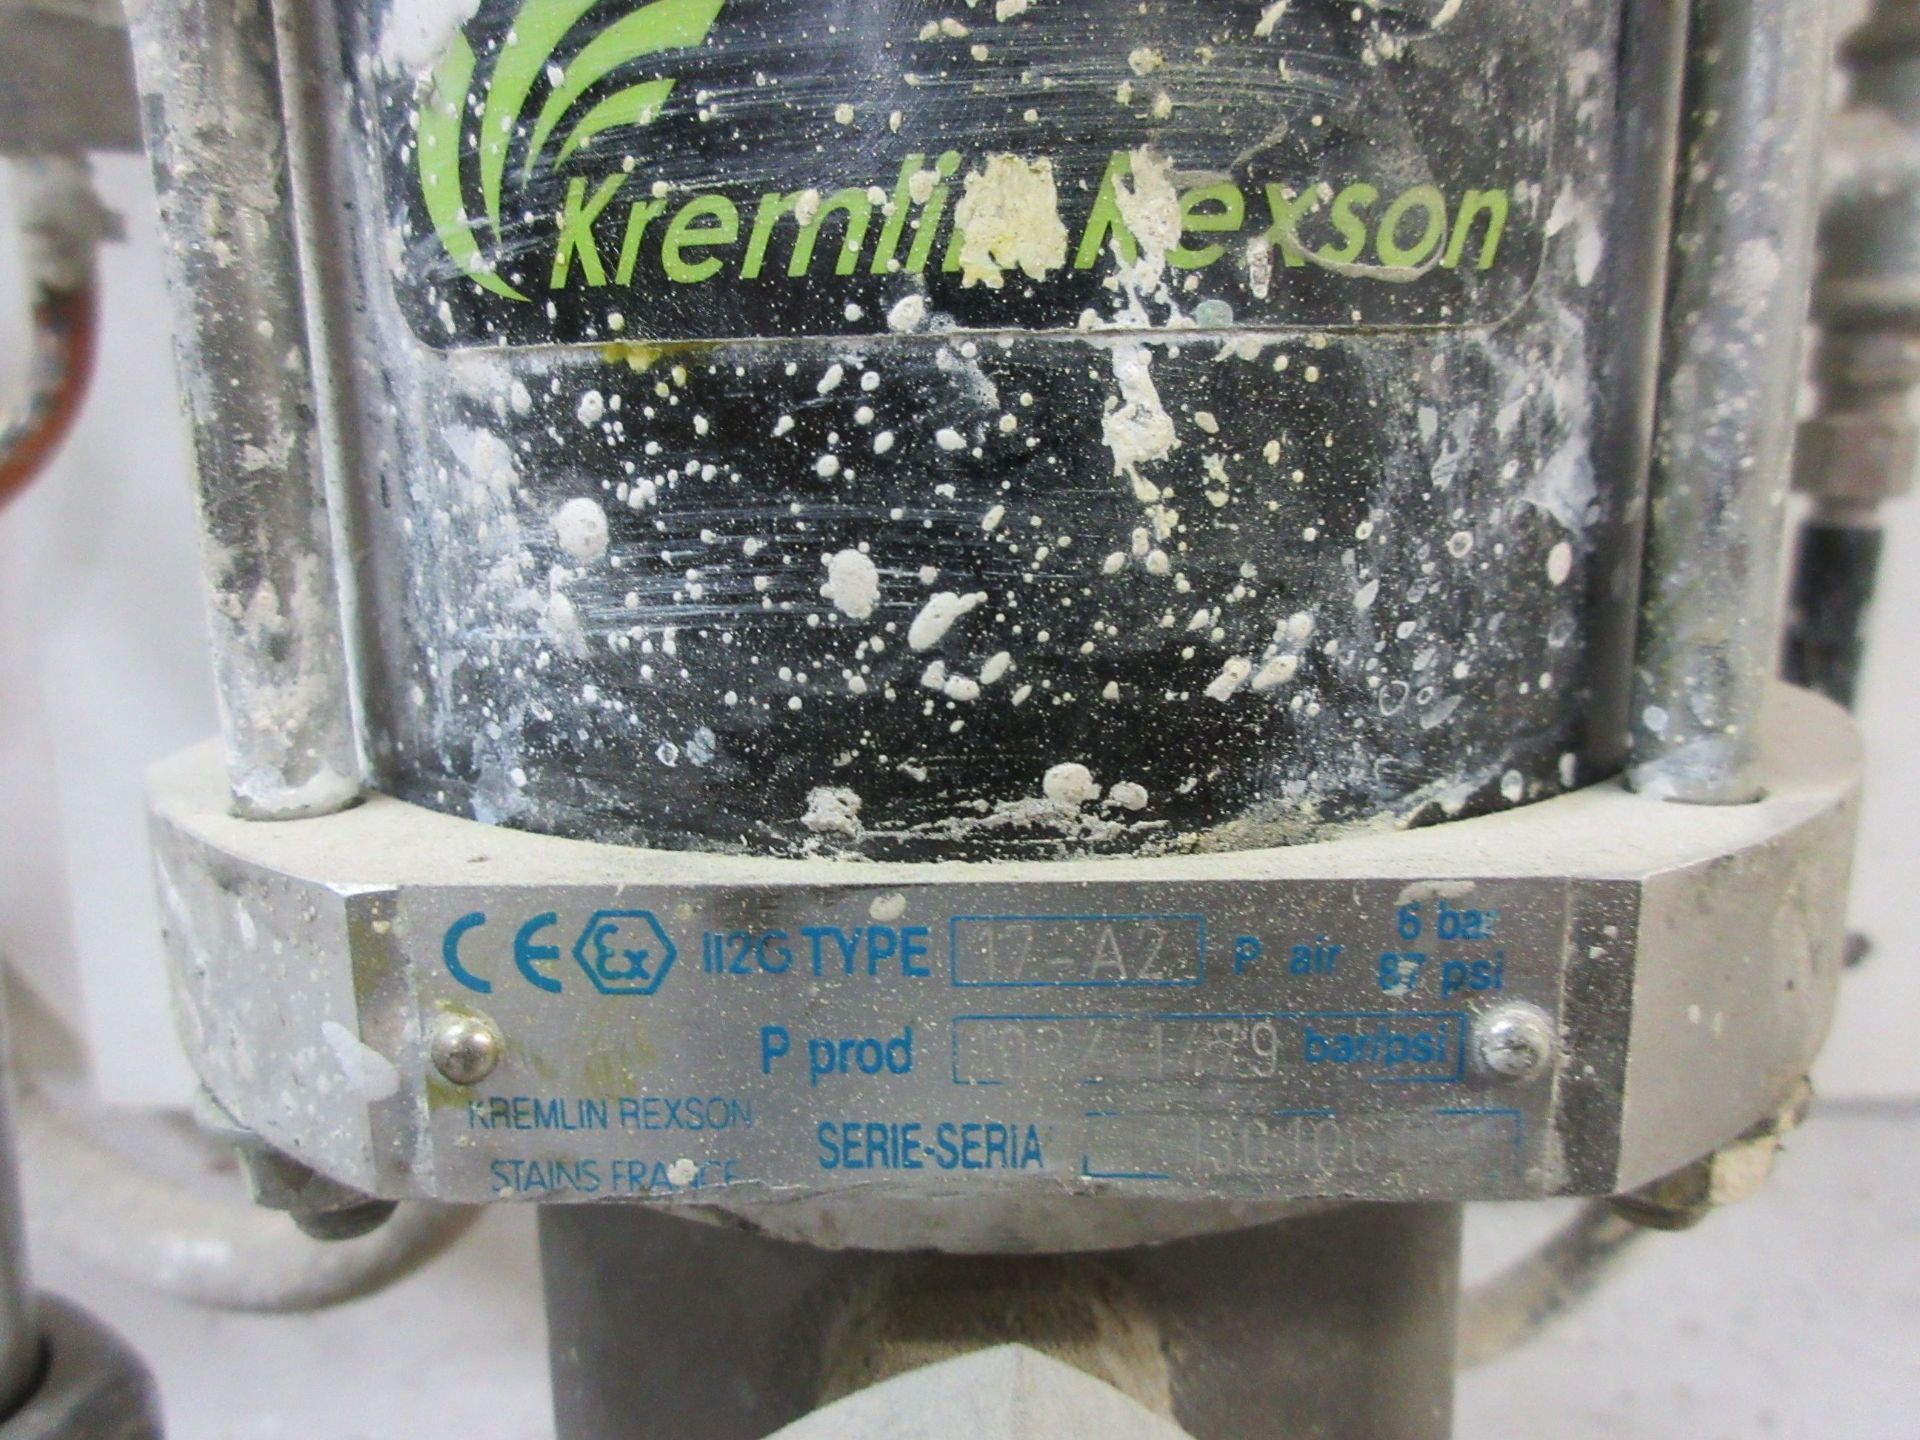 KREMLIN NEXON paint pump - Image 2 of 2